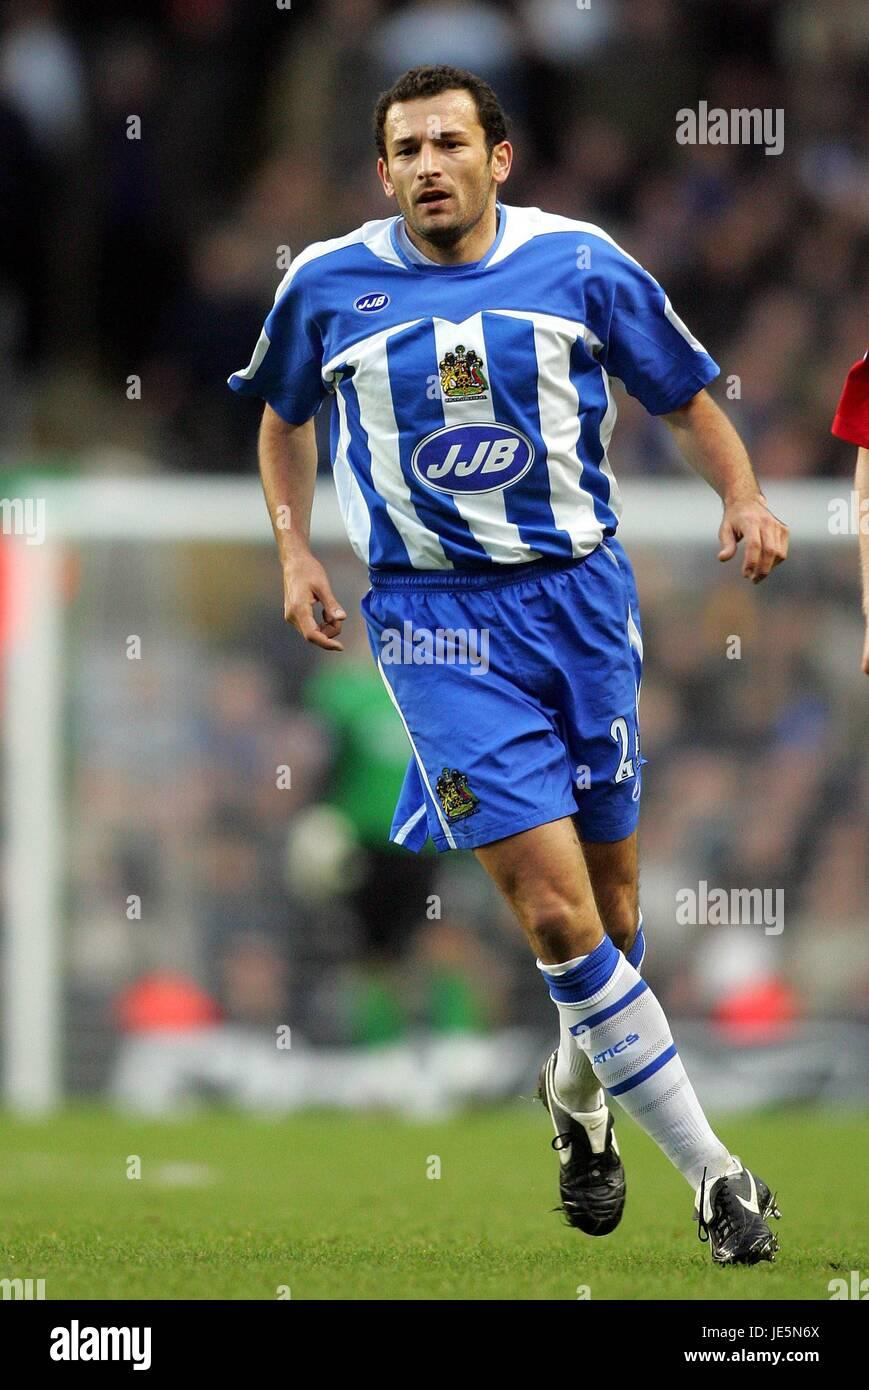 JOSIP SKOKO WIGAN ATHLETIC FC ANFIELD LIVERPOOL ENGLAND 03 December 2005 Stock Photo